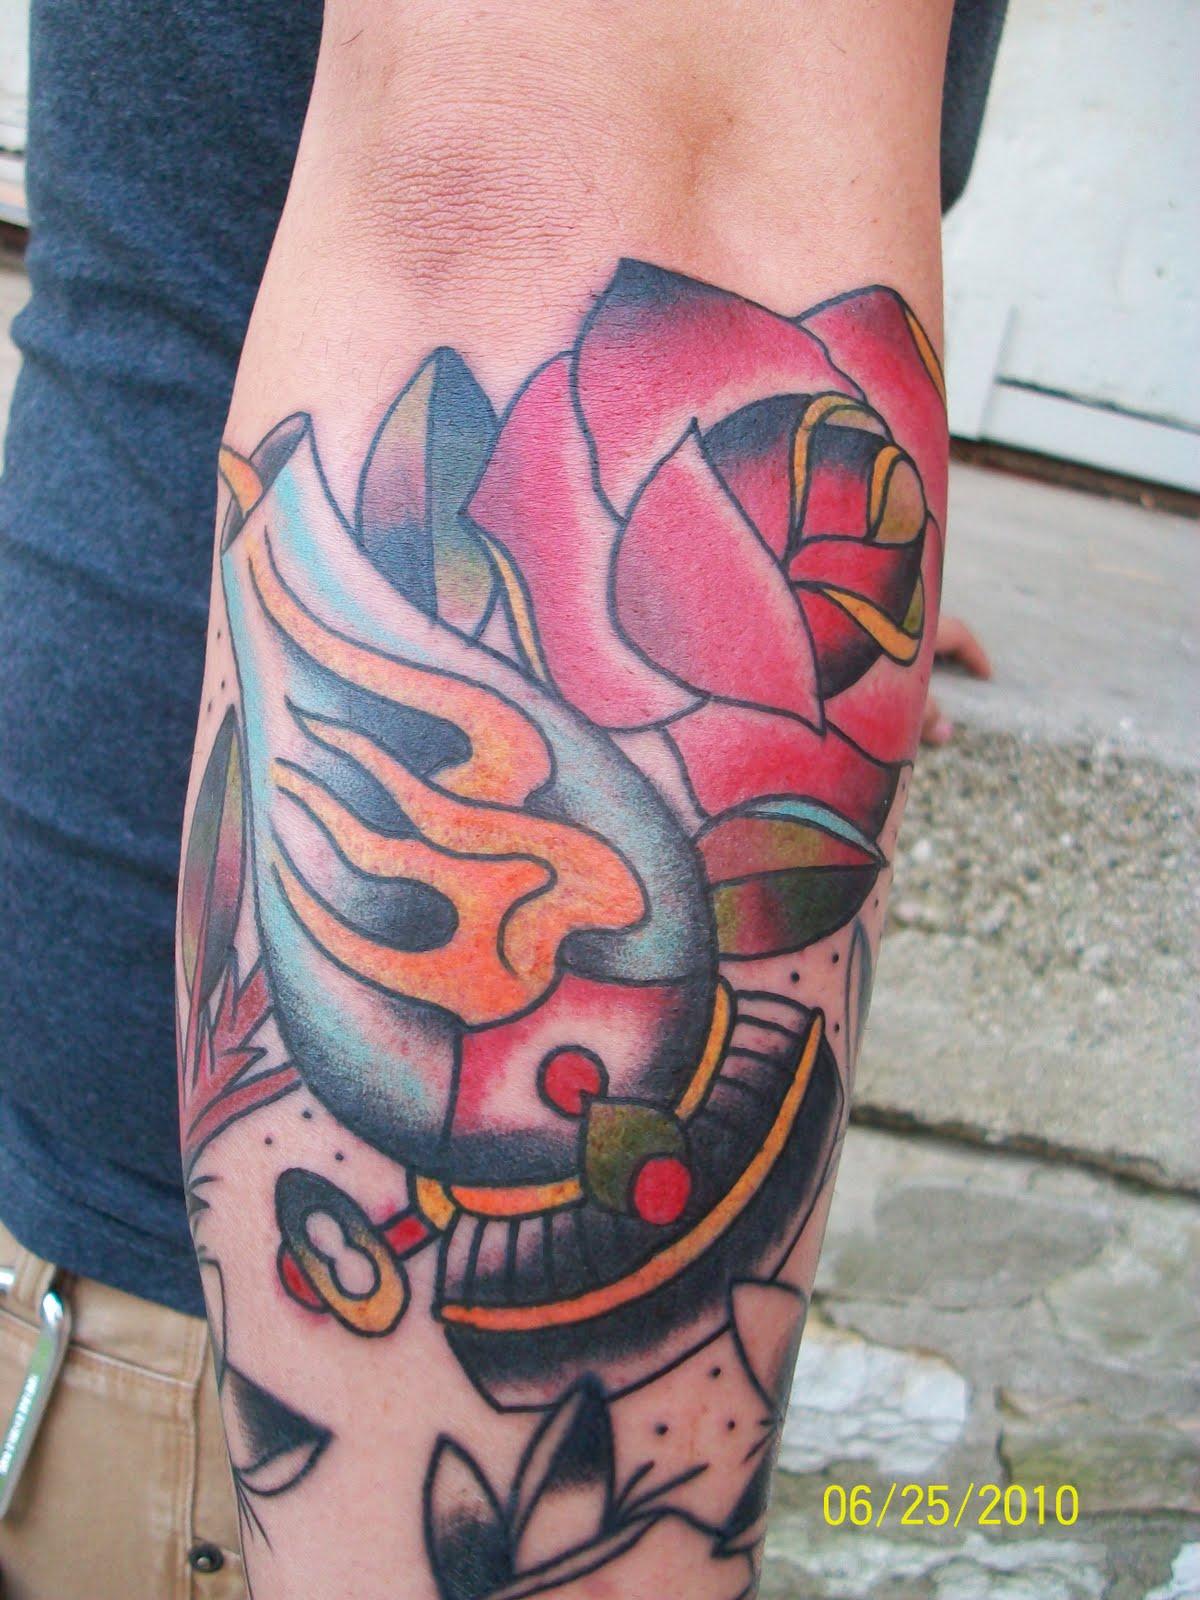 Paul meadows tattoo tattoos haircuts for Tattoo lafayette indiana